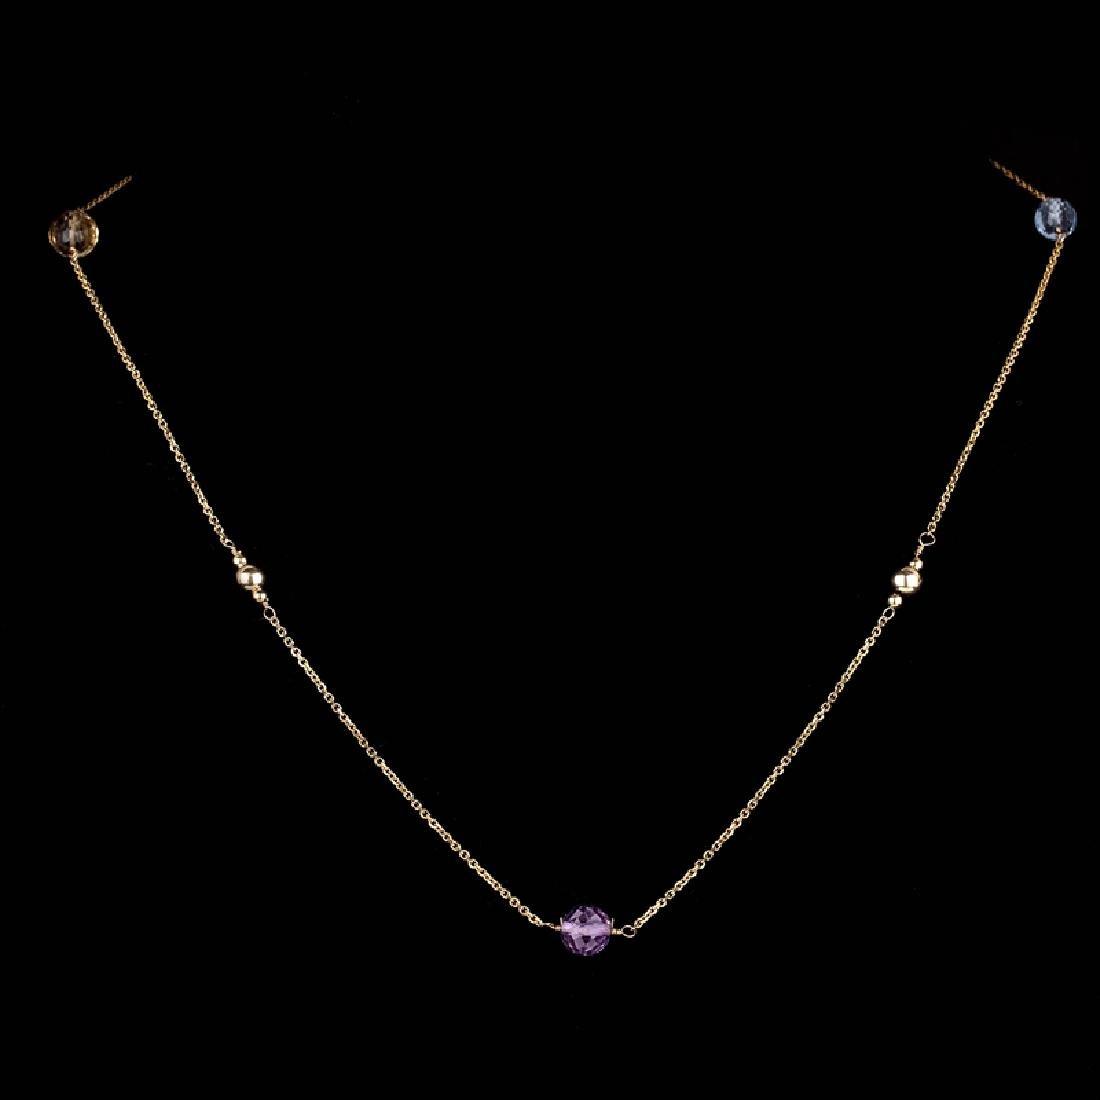 *14 KT Gold, Diamond Cut, 2.7GR, 16'' Amethyst, Blue